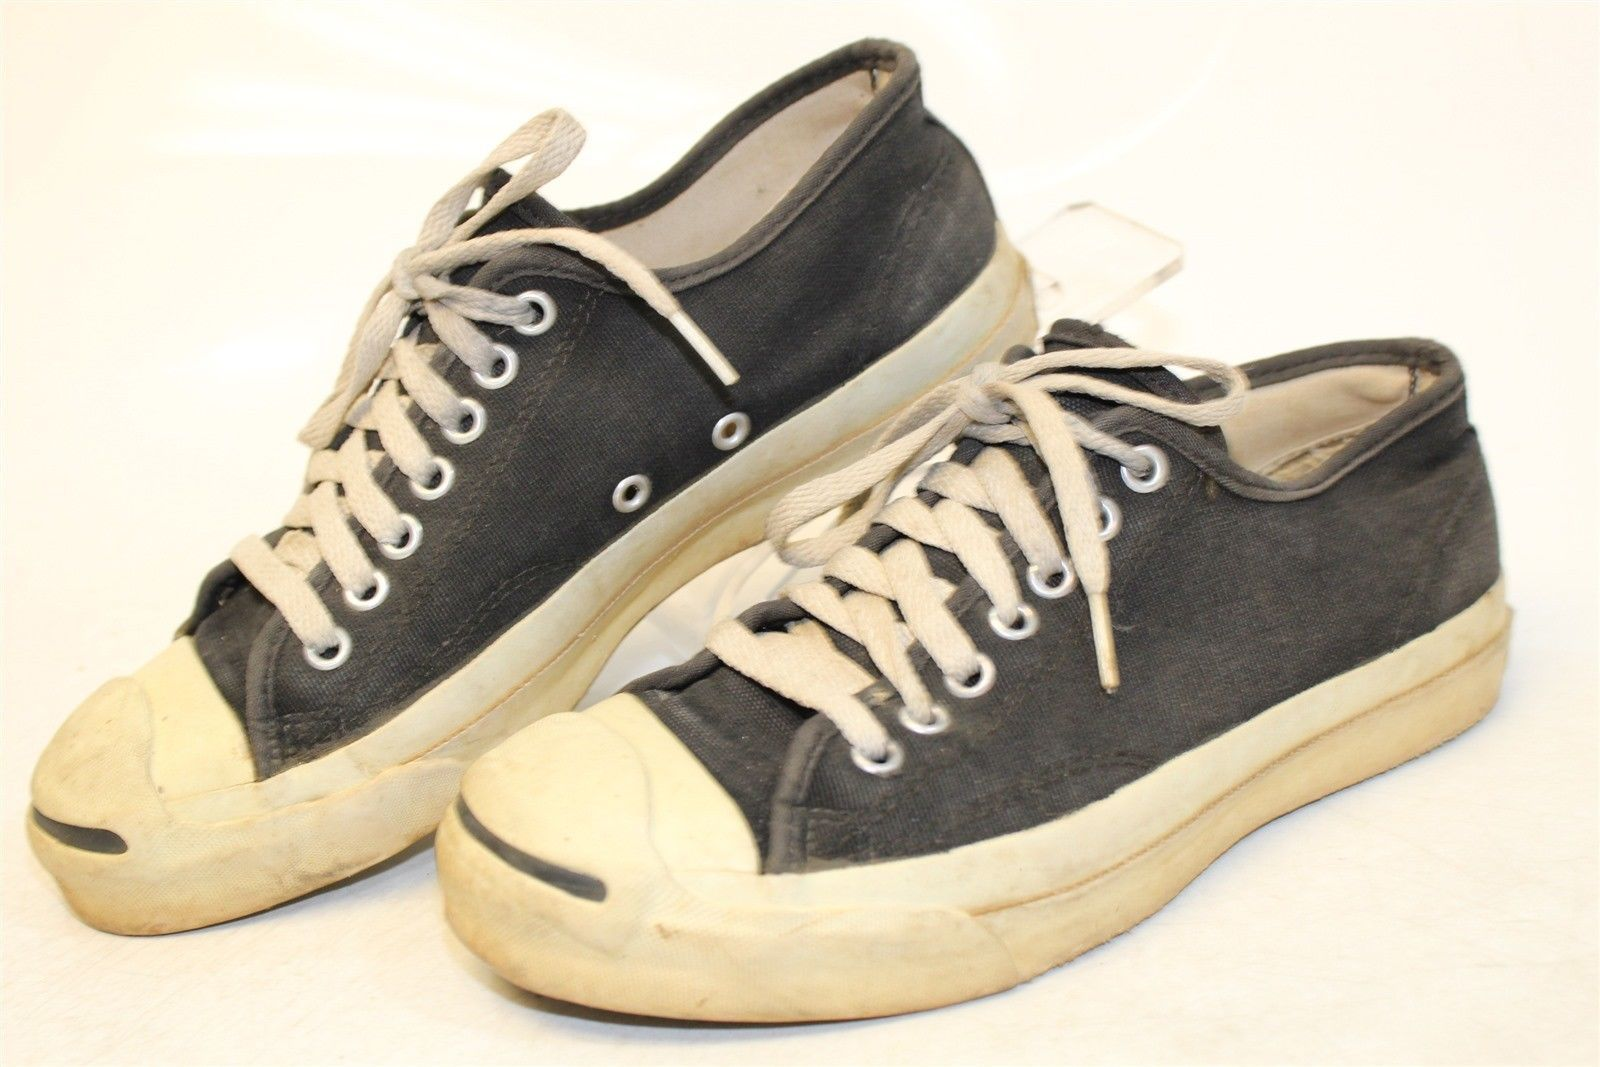 703856de96a5 Converse Vintage Jack Purcell USA Made Men s 7 OG VTG Sneakers Shoes gx